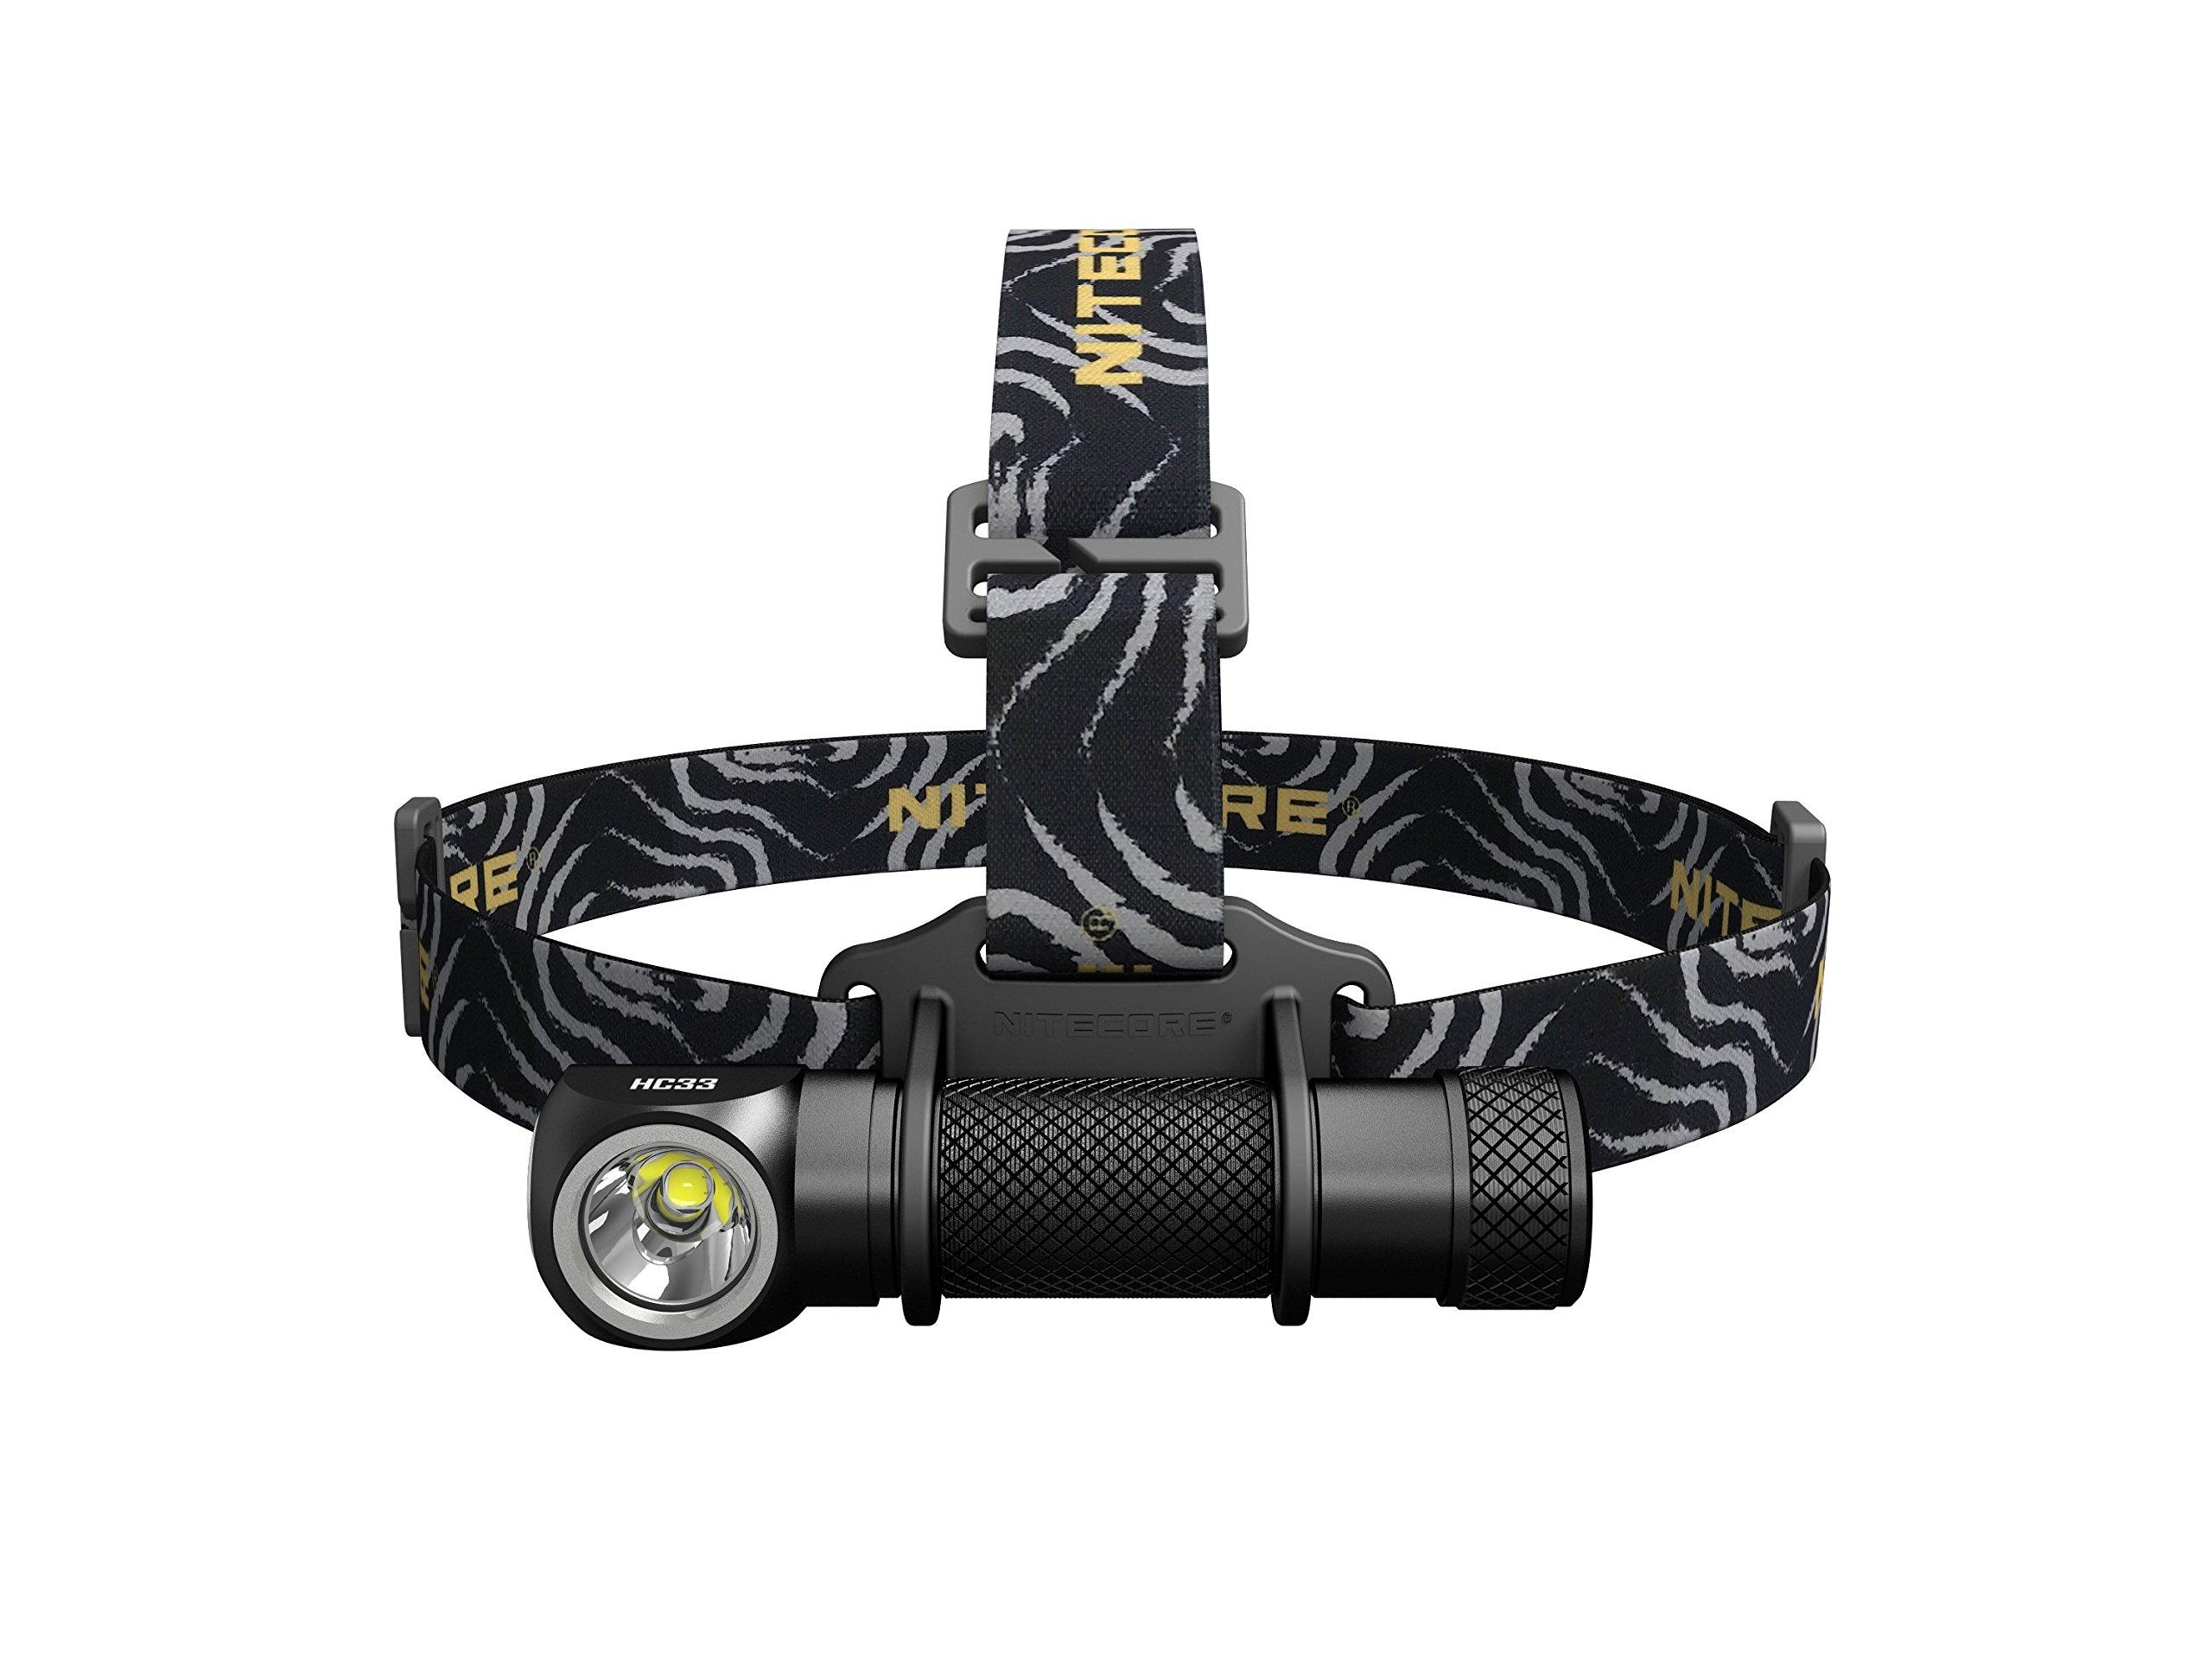 Linternas : Nitecore HC33 1800 Lumen L-Shape High...